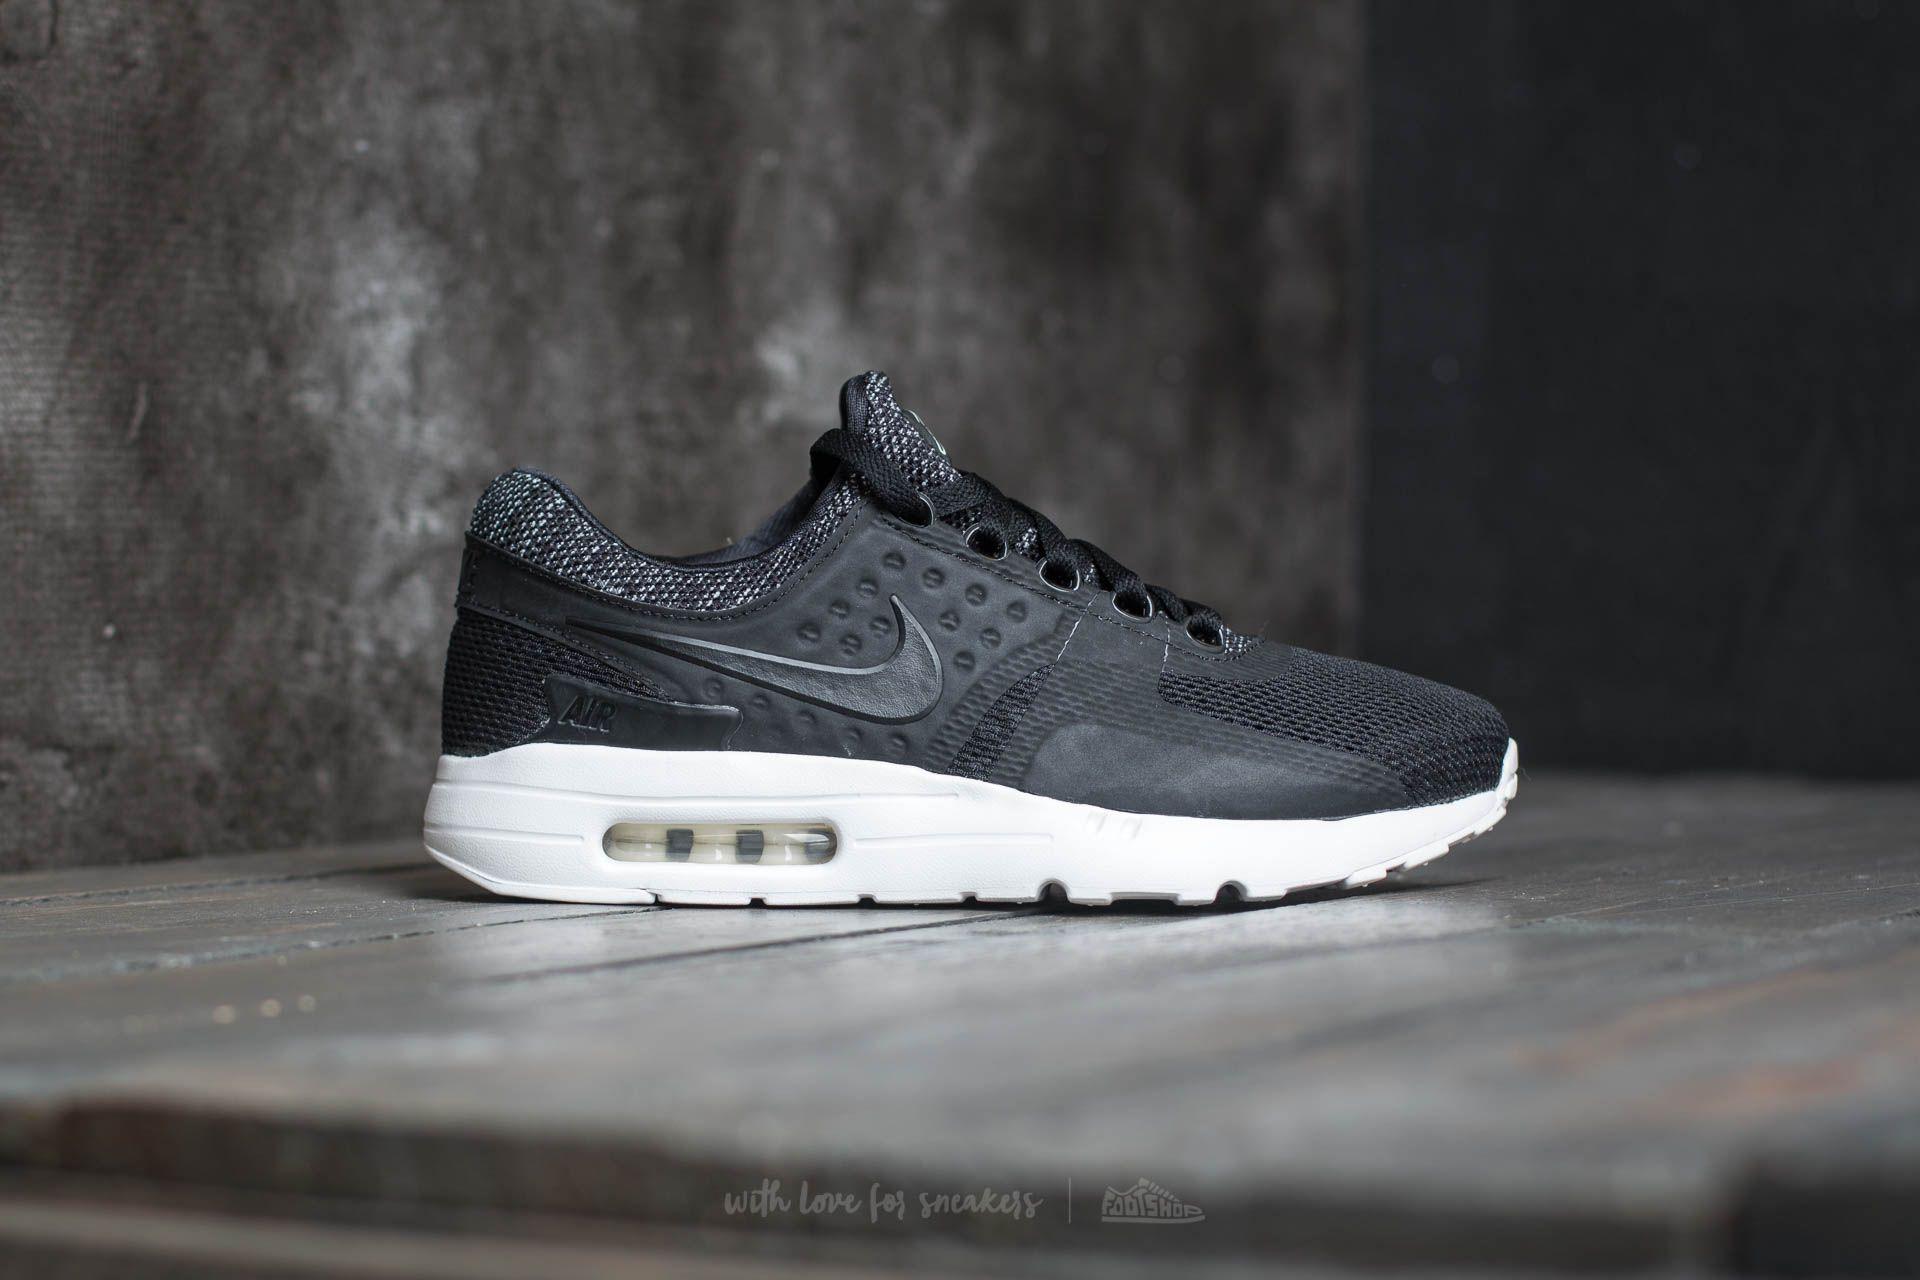 official photos 82d91 7c971 Nike Air Max Zero BR Black/ Black-Pale Grey | Footshop